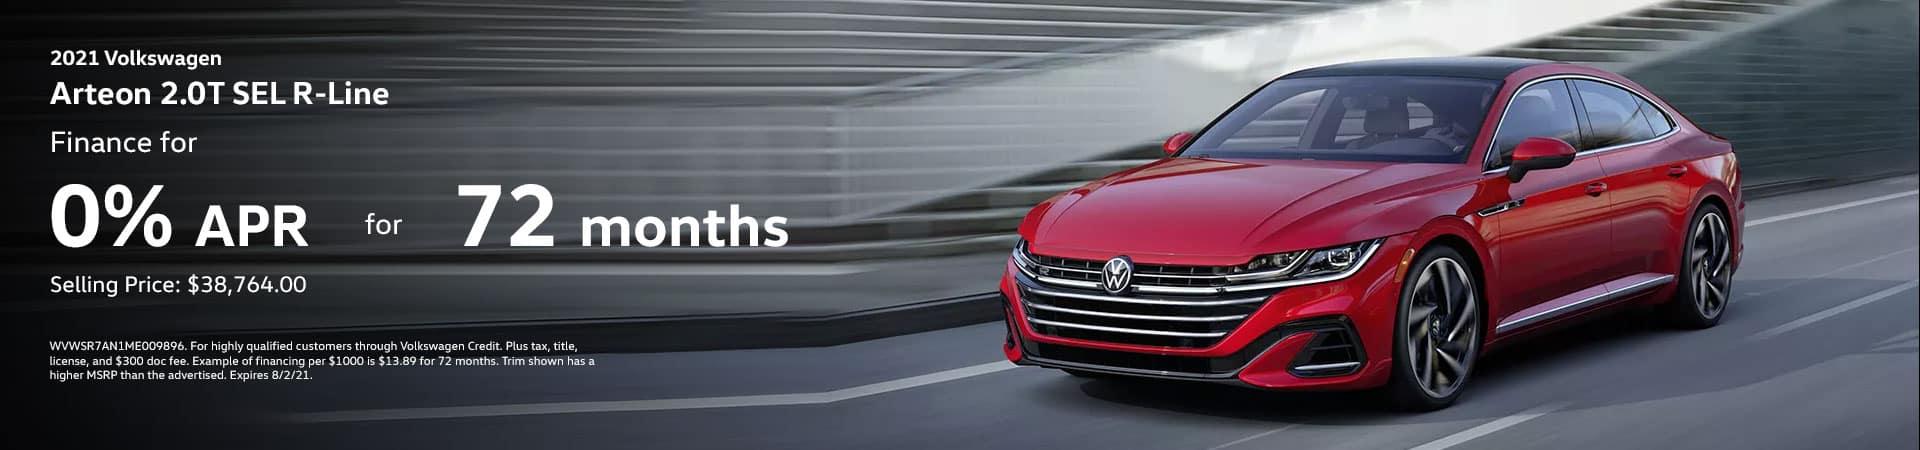 2021 Volkswagen Arteon 2.0T SEL Finance For 0% for 72 months